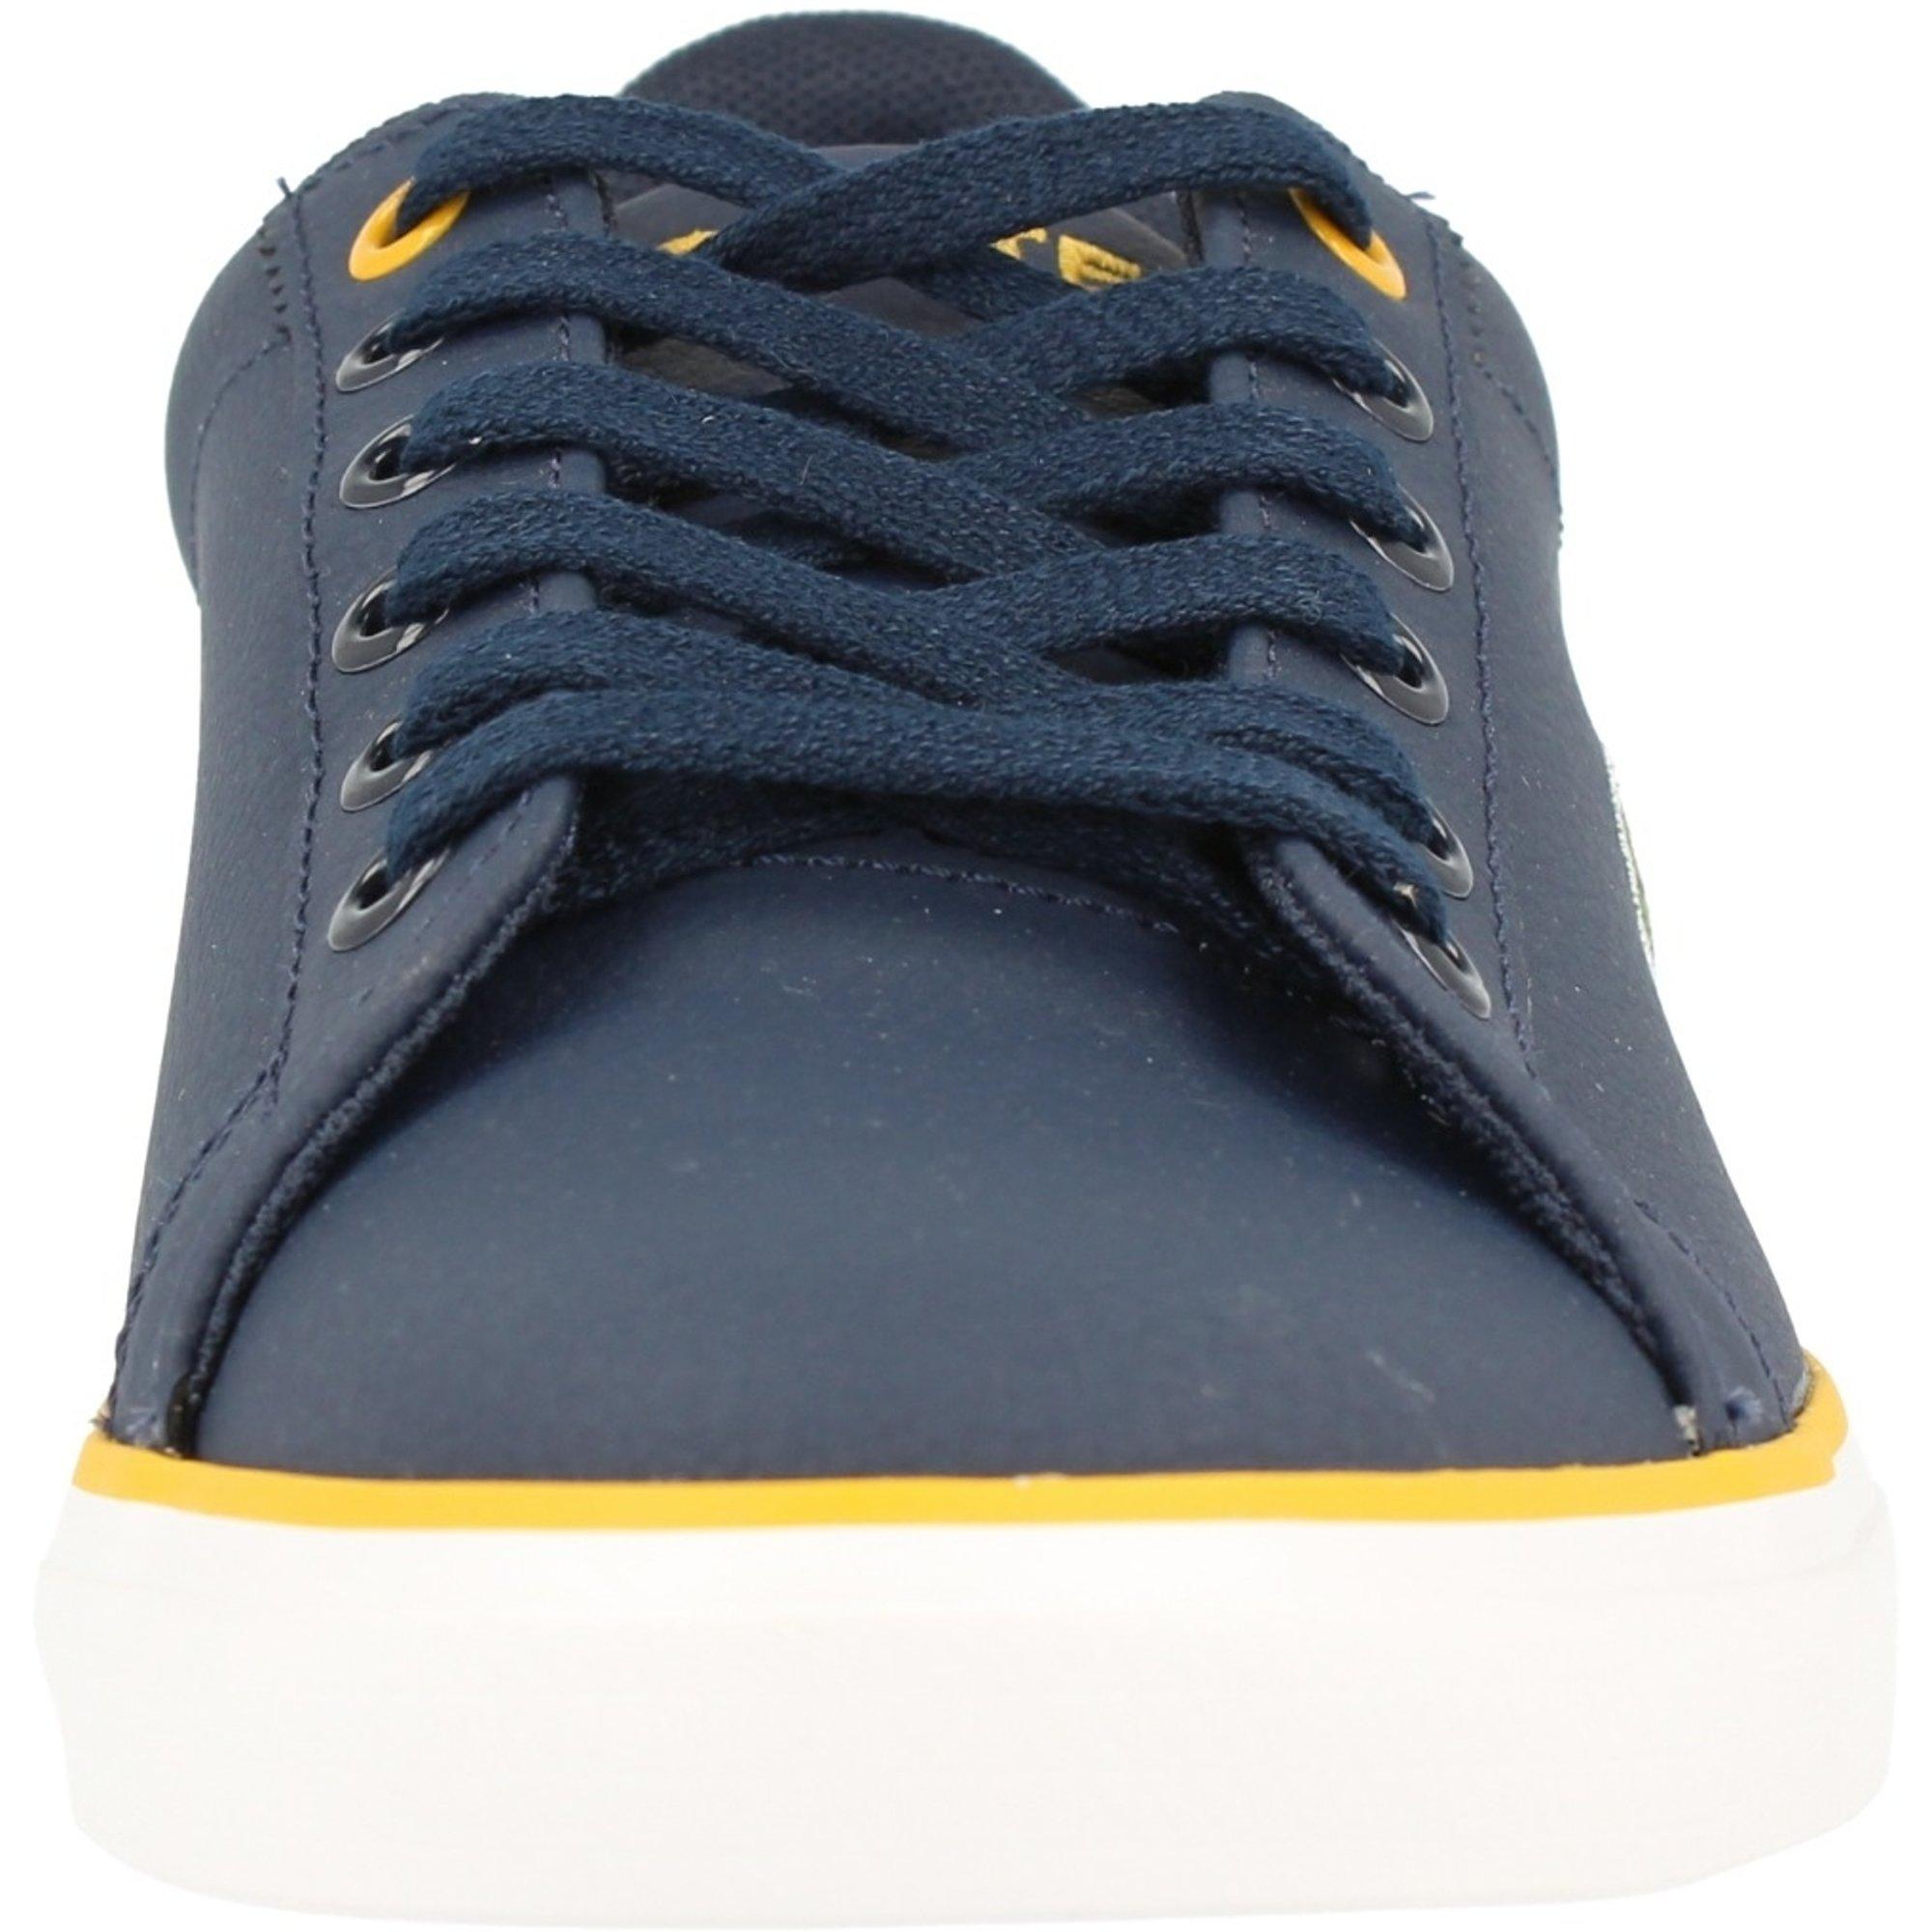 Lacoste Lerond 319 1 Navy/Dark Yellow Synthetic